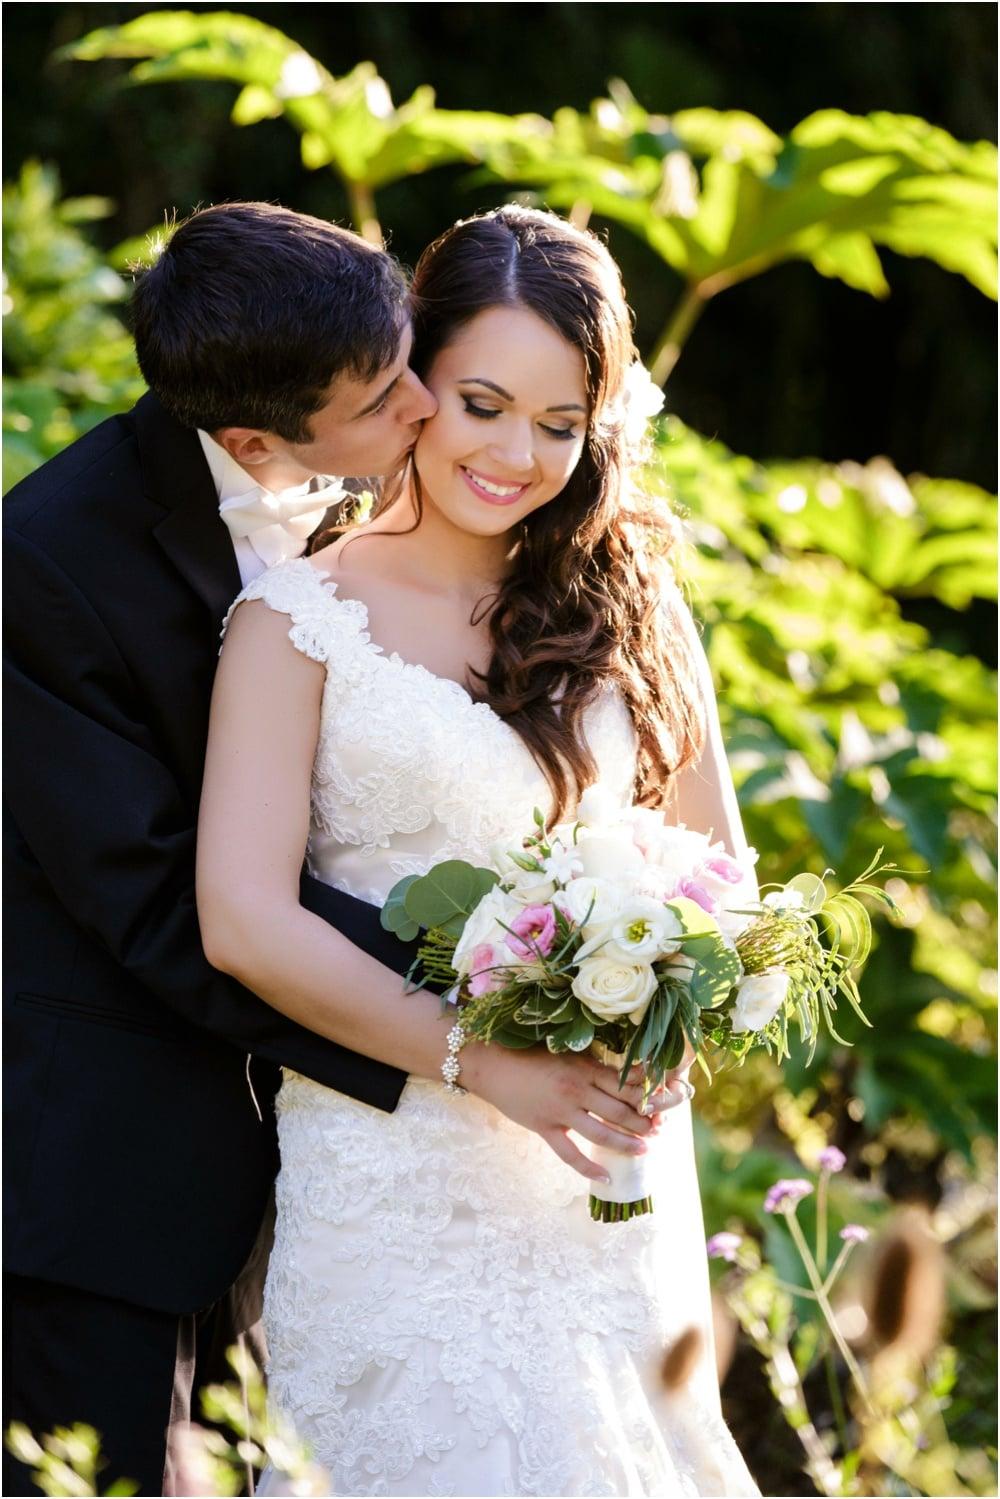 RI-Wedding-Photographer-Lefebvre-Photo-Blog_2430.jpg